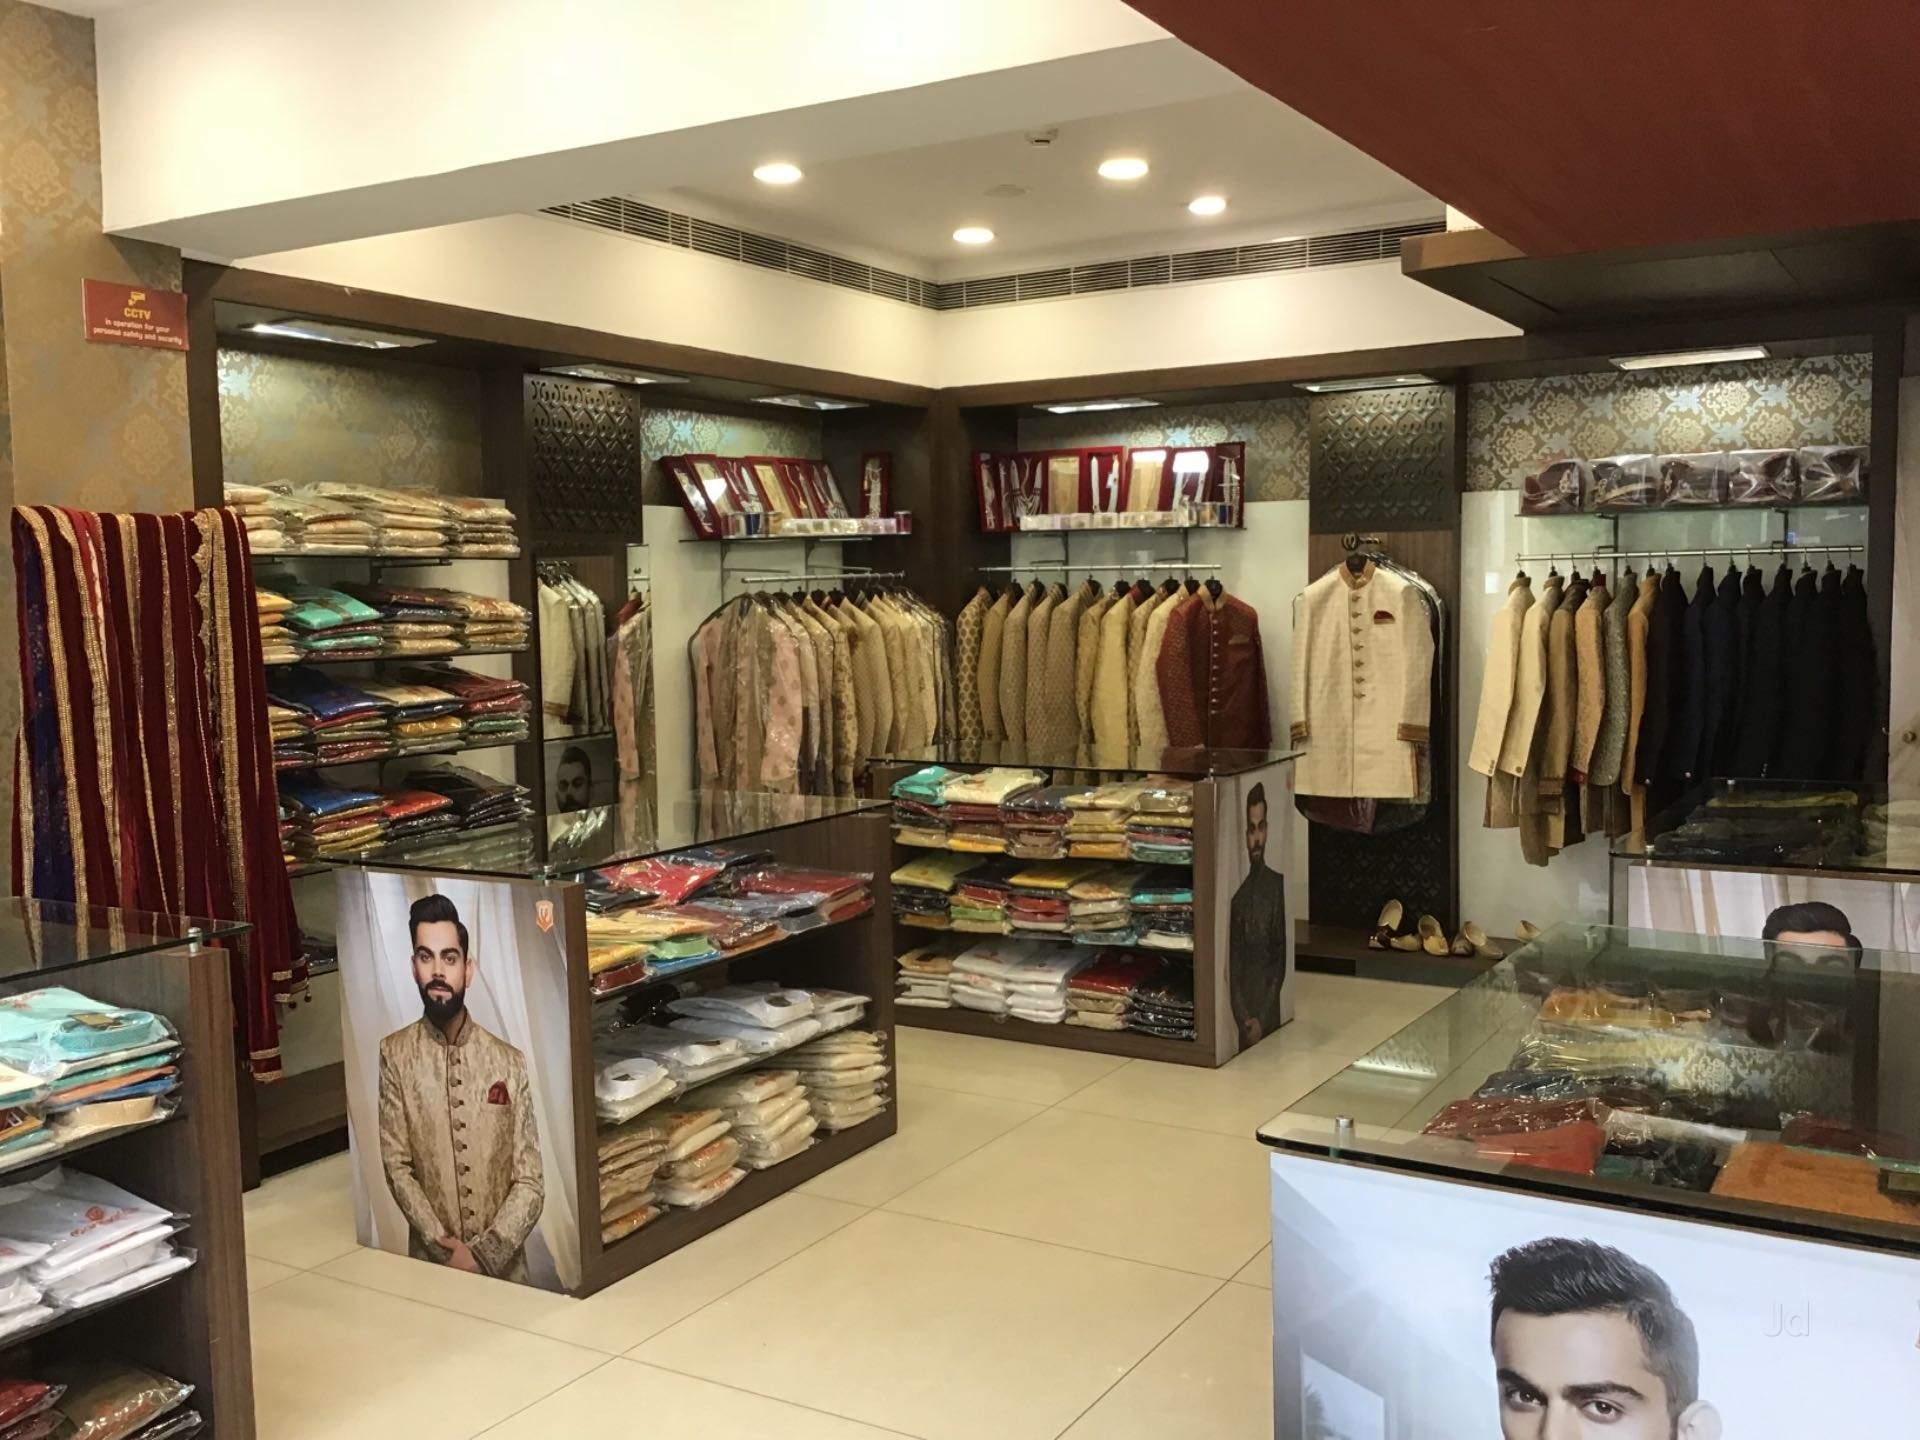 c34e98e7c07 Top 100 Us Polo Assn Gents Readymade Garment Retailers in Habsiguda ...